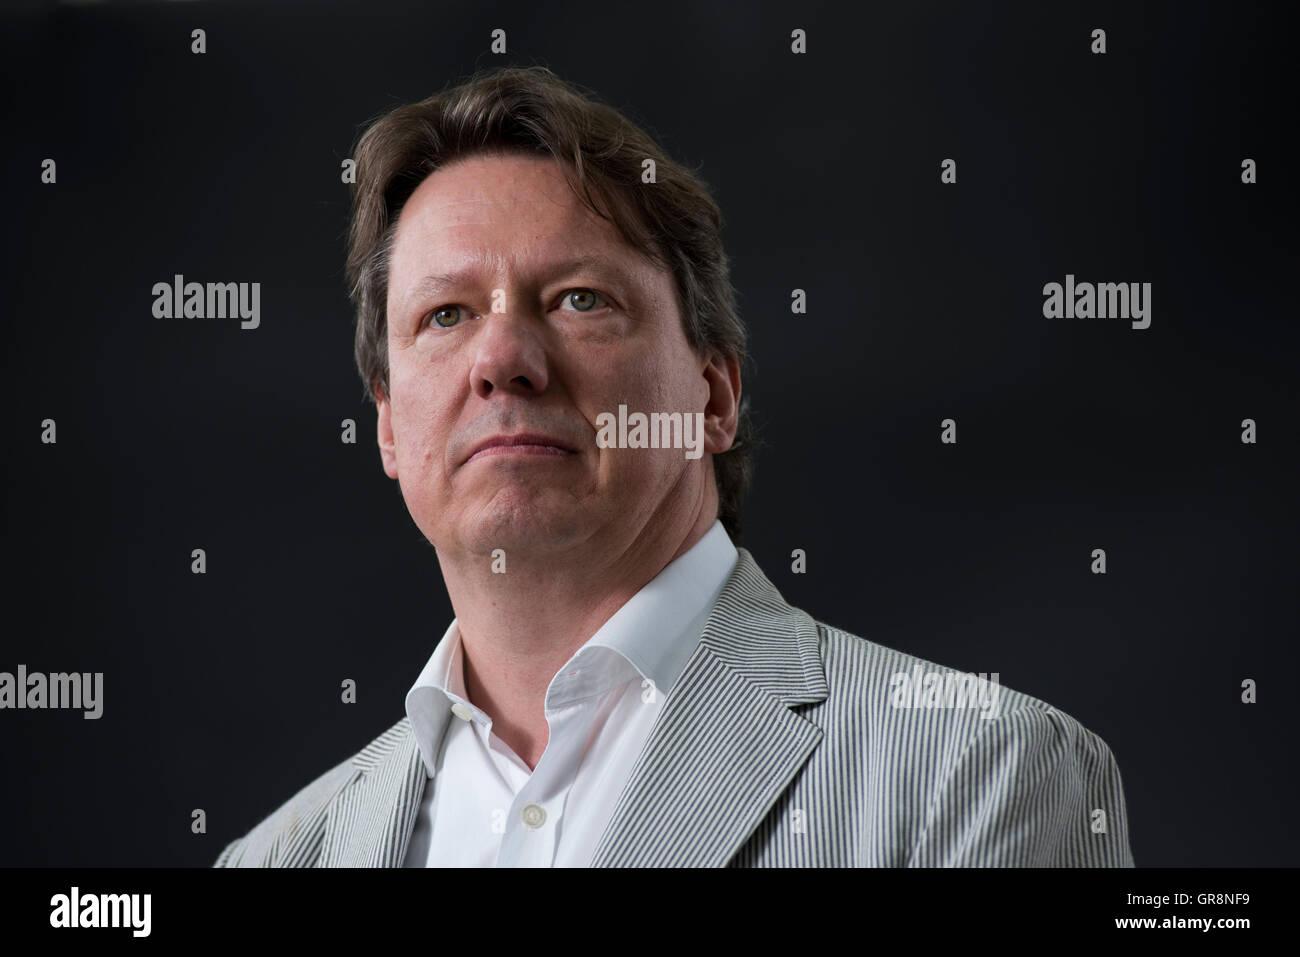 Autor und Biograf Donald Sturrock. Stockbild